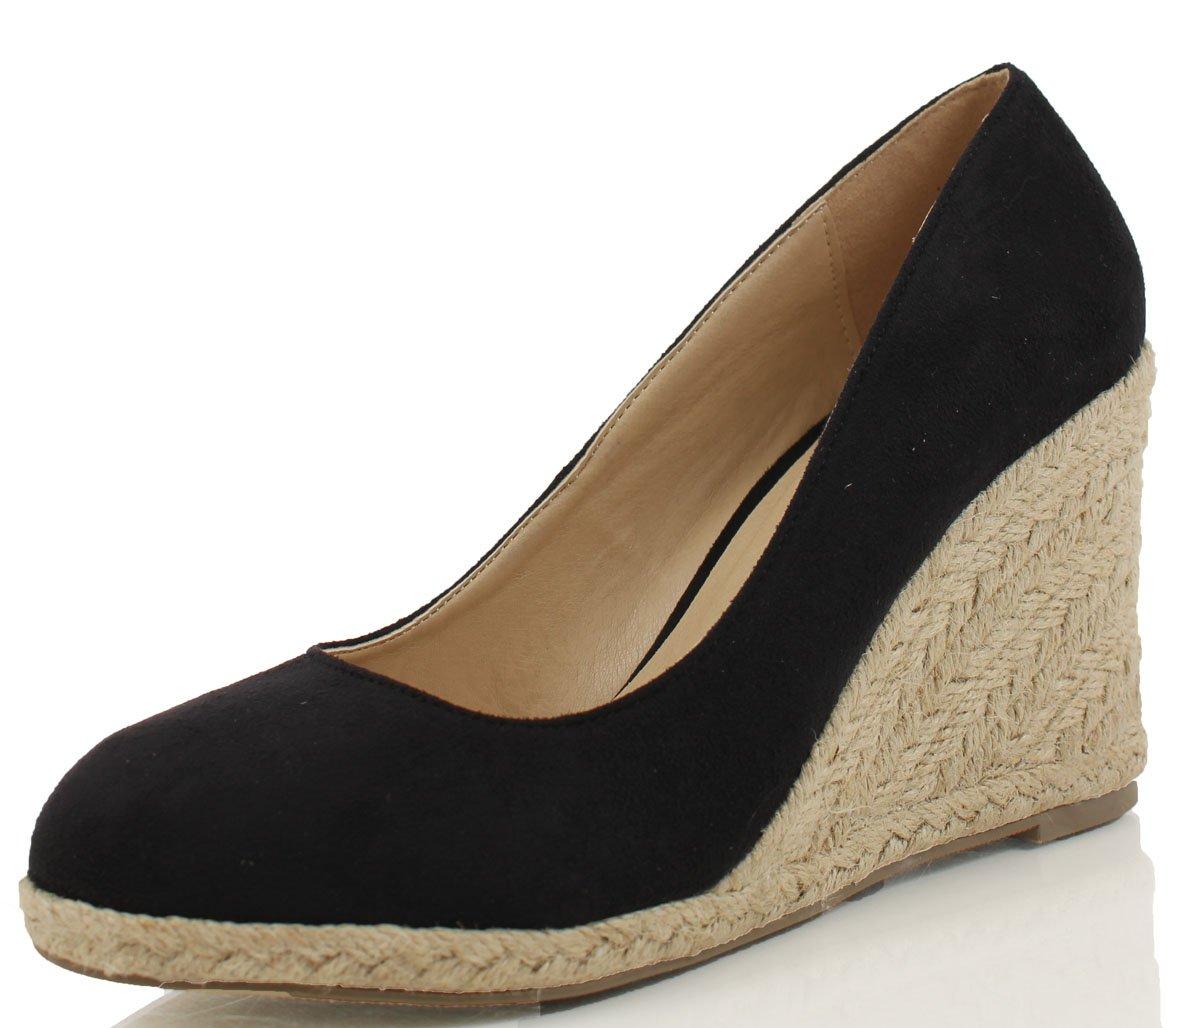 Delicious Women's Parma Round Toe Espadrille Wedge Slip on Sandals B00WXRRXFS 8.5 B(M) US Black